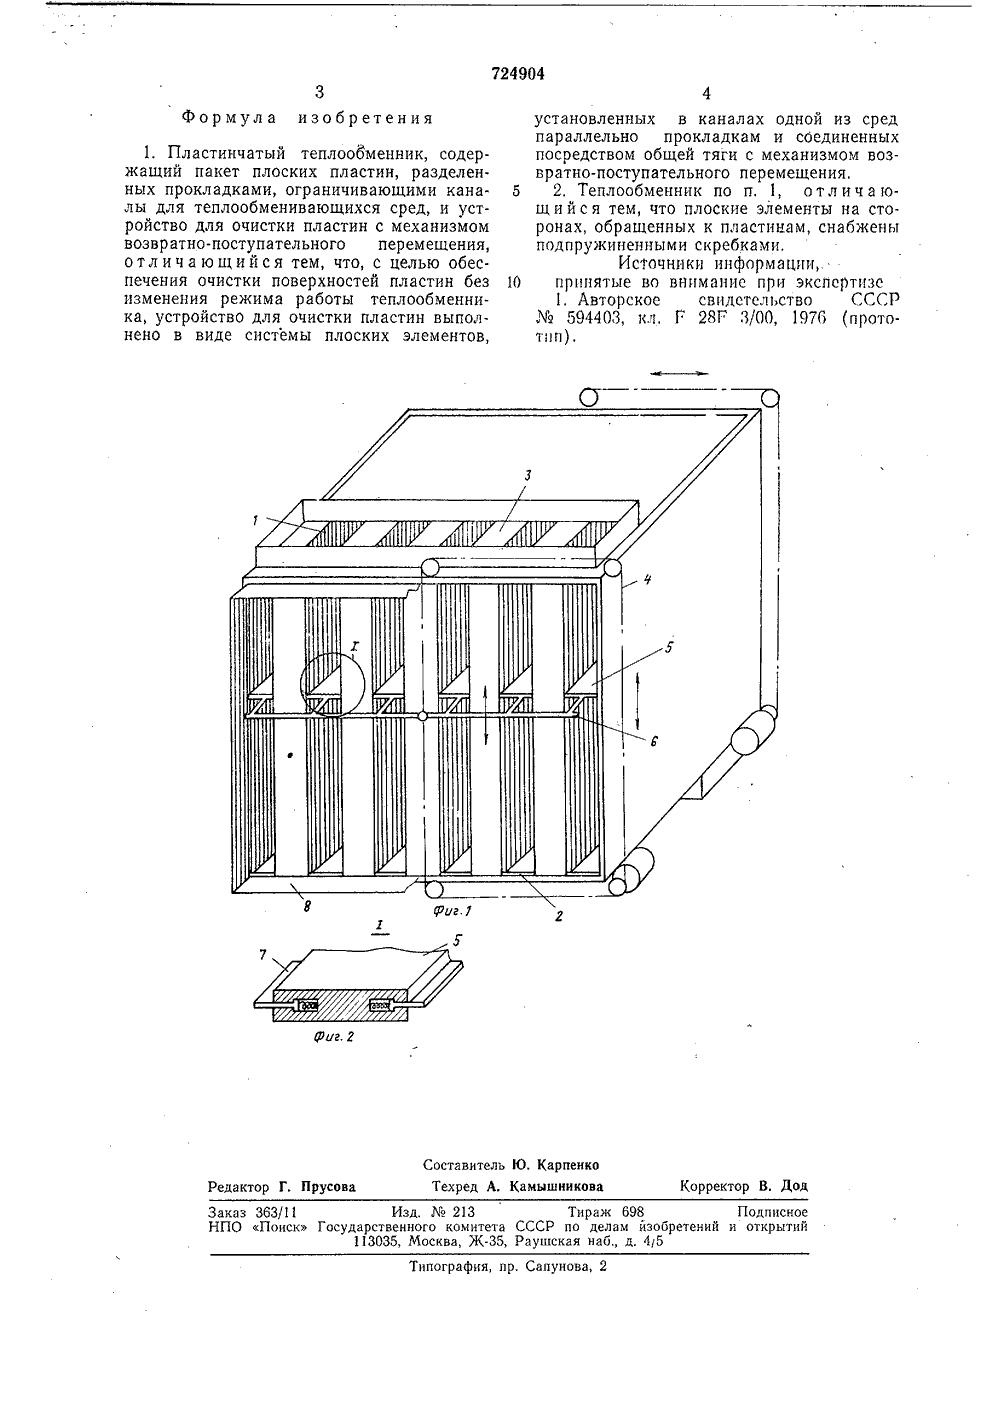 Рсчет пластинчатого теплообменника теплообменник eco 6-690/460